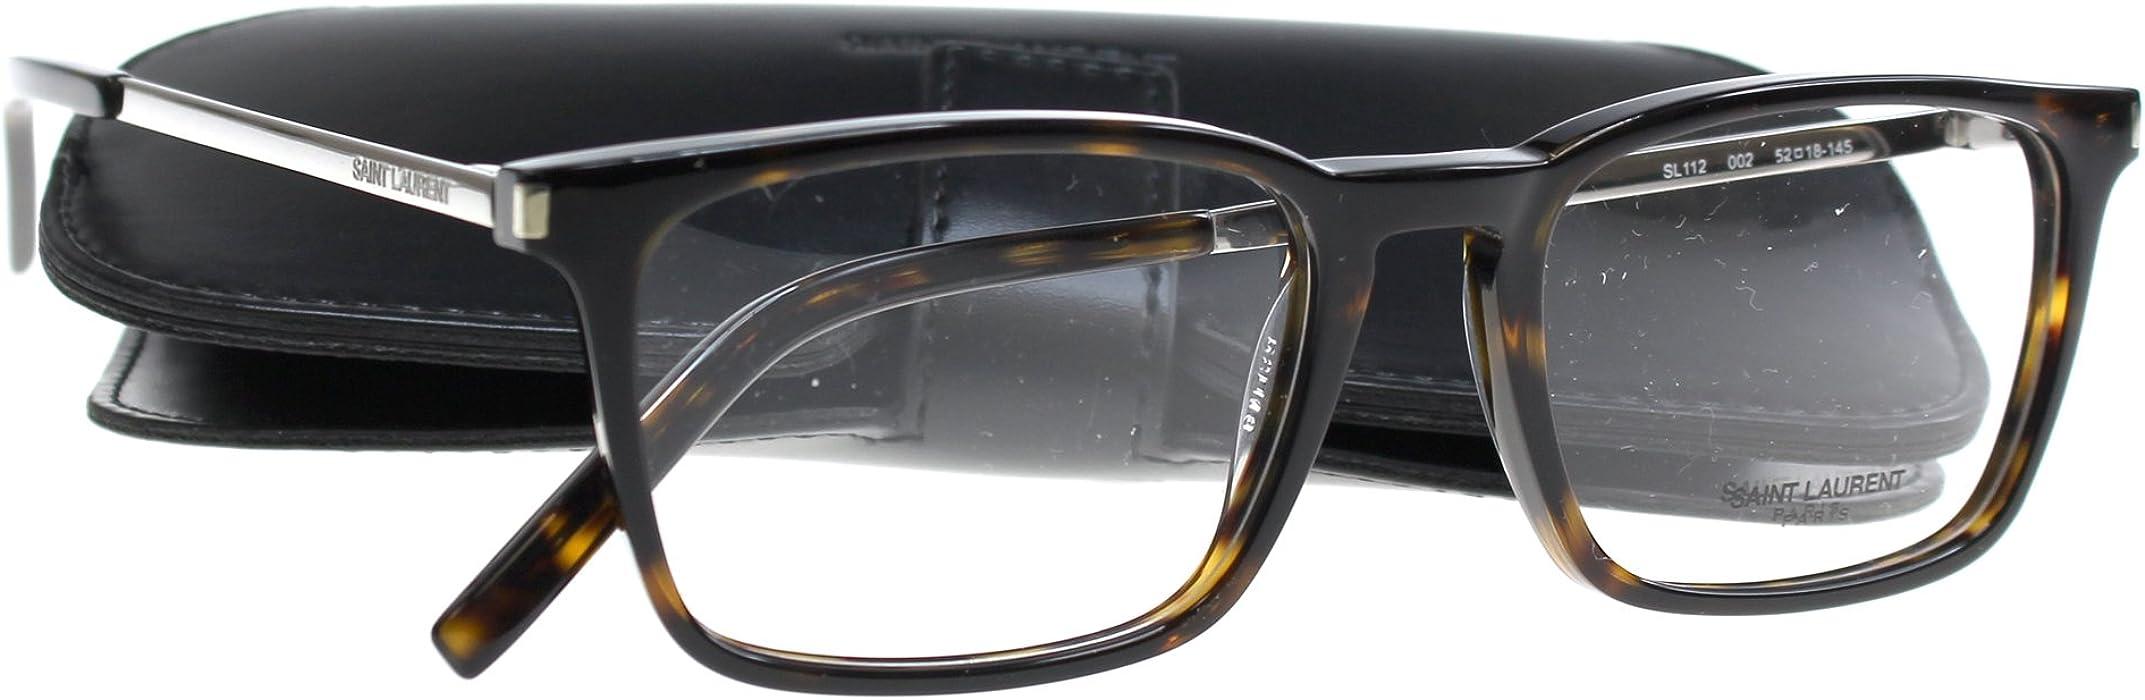 d7dd026f175 New SAINT LAURENT Eyeglasses Women SL 112 Brown 2 SL112 52mm at ...